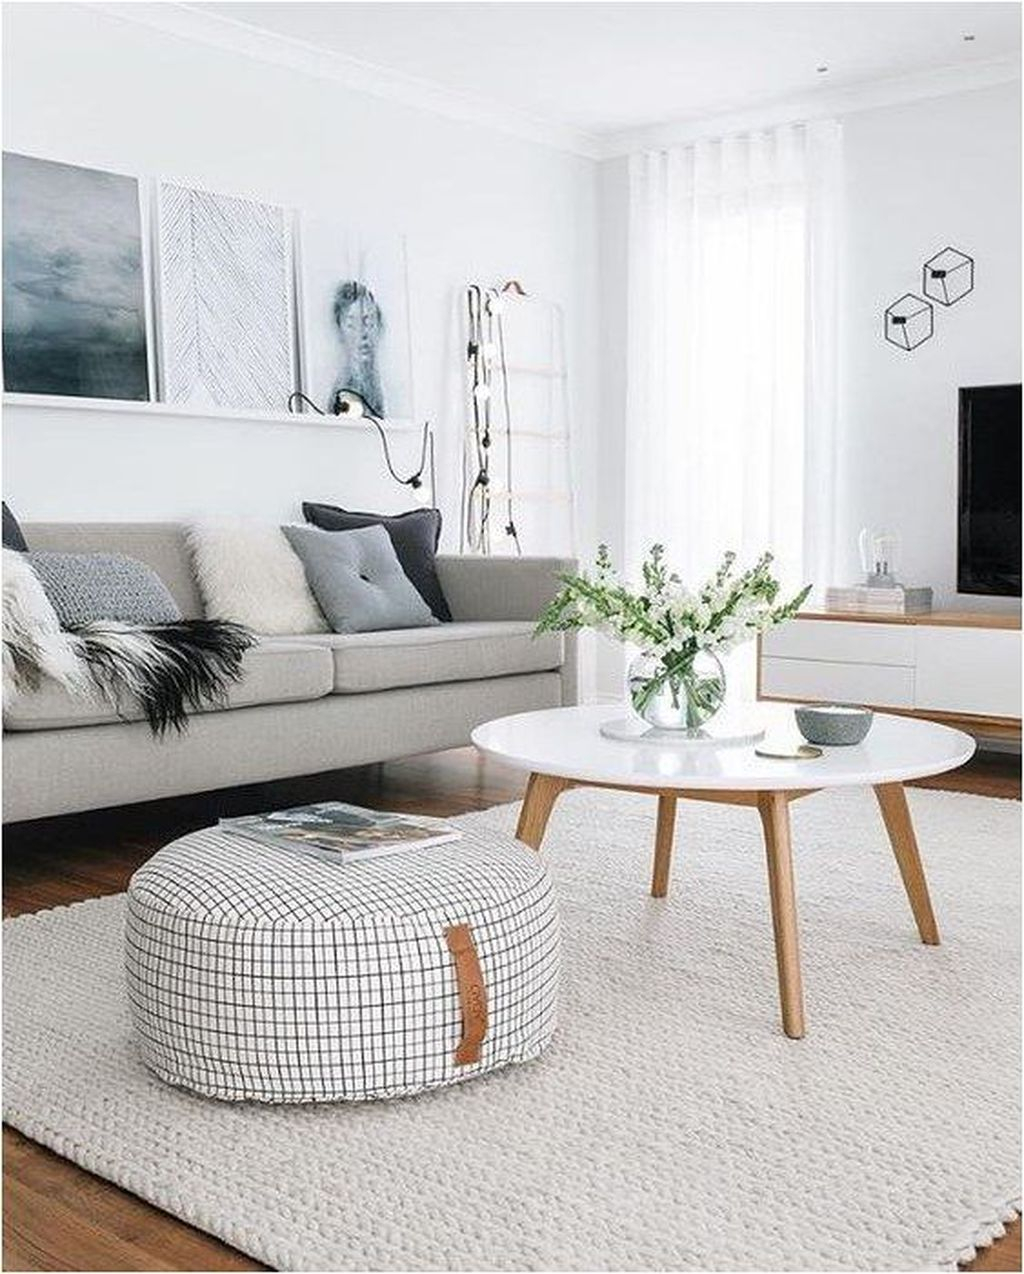 Enchanting Living Room Decor Ideas That Trending This Winter 03